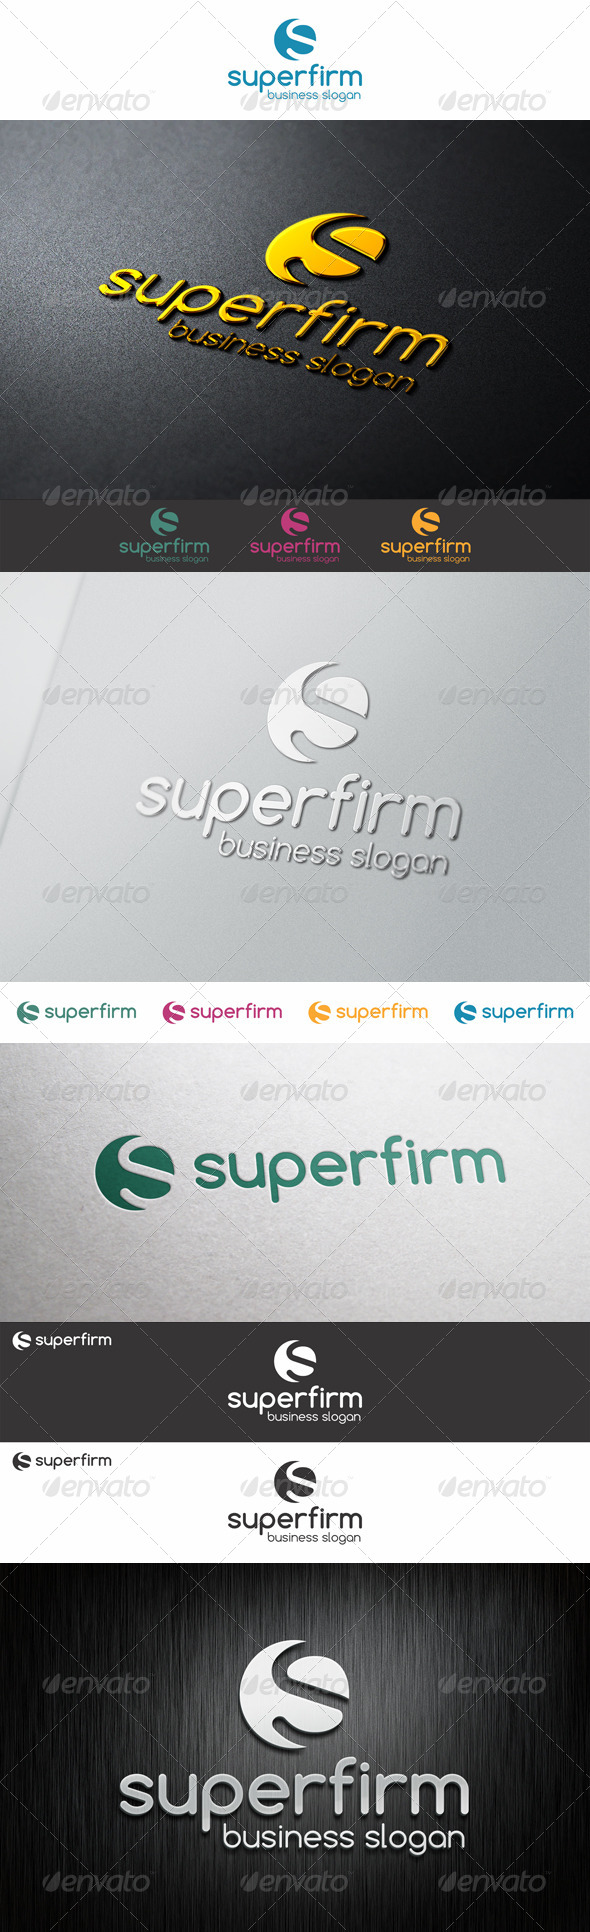 S Logo Shape - Super Firm - Letters Logo Templates